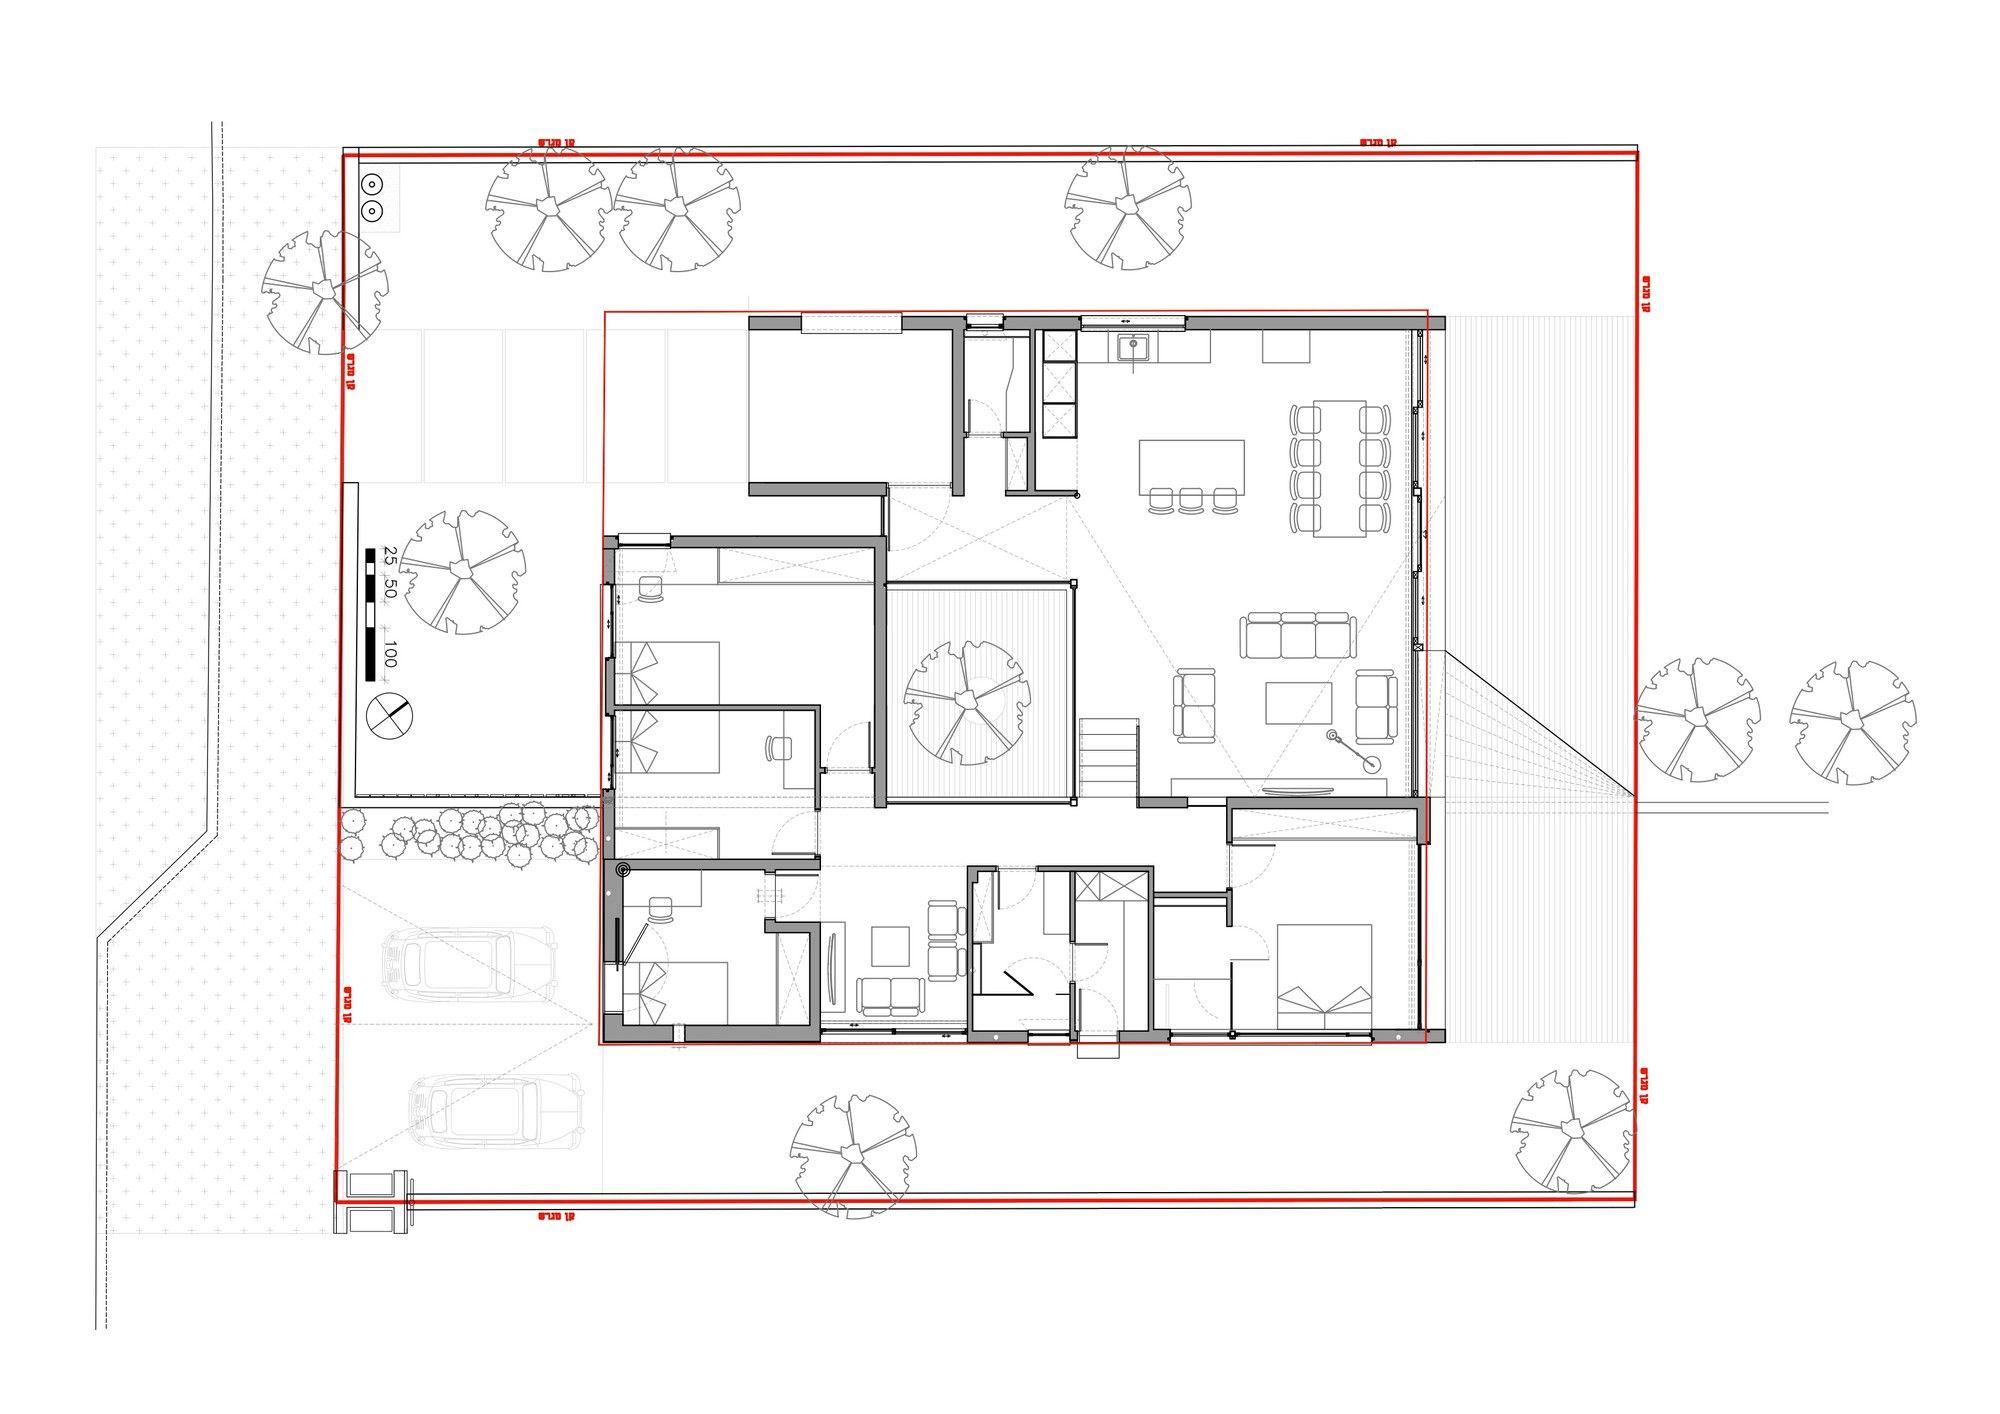 hsm house so architecture kuce pinterest